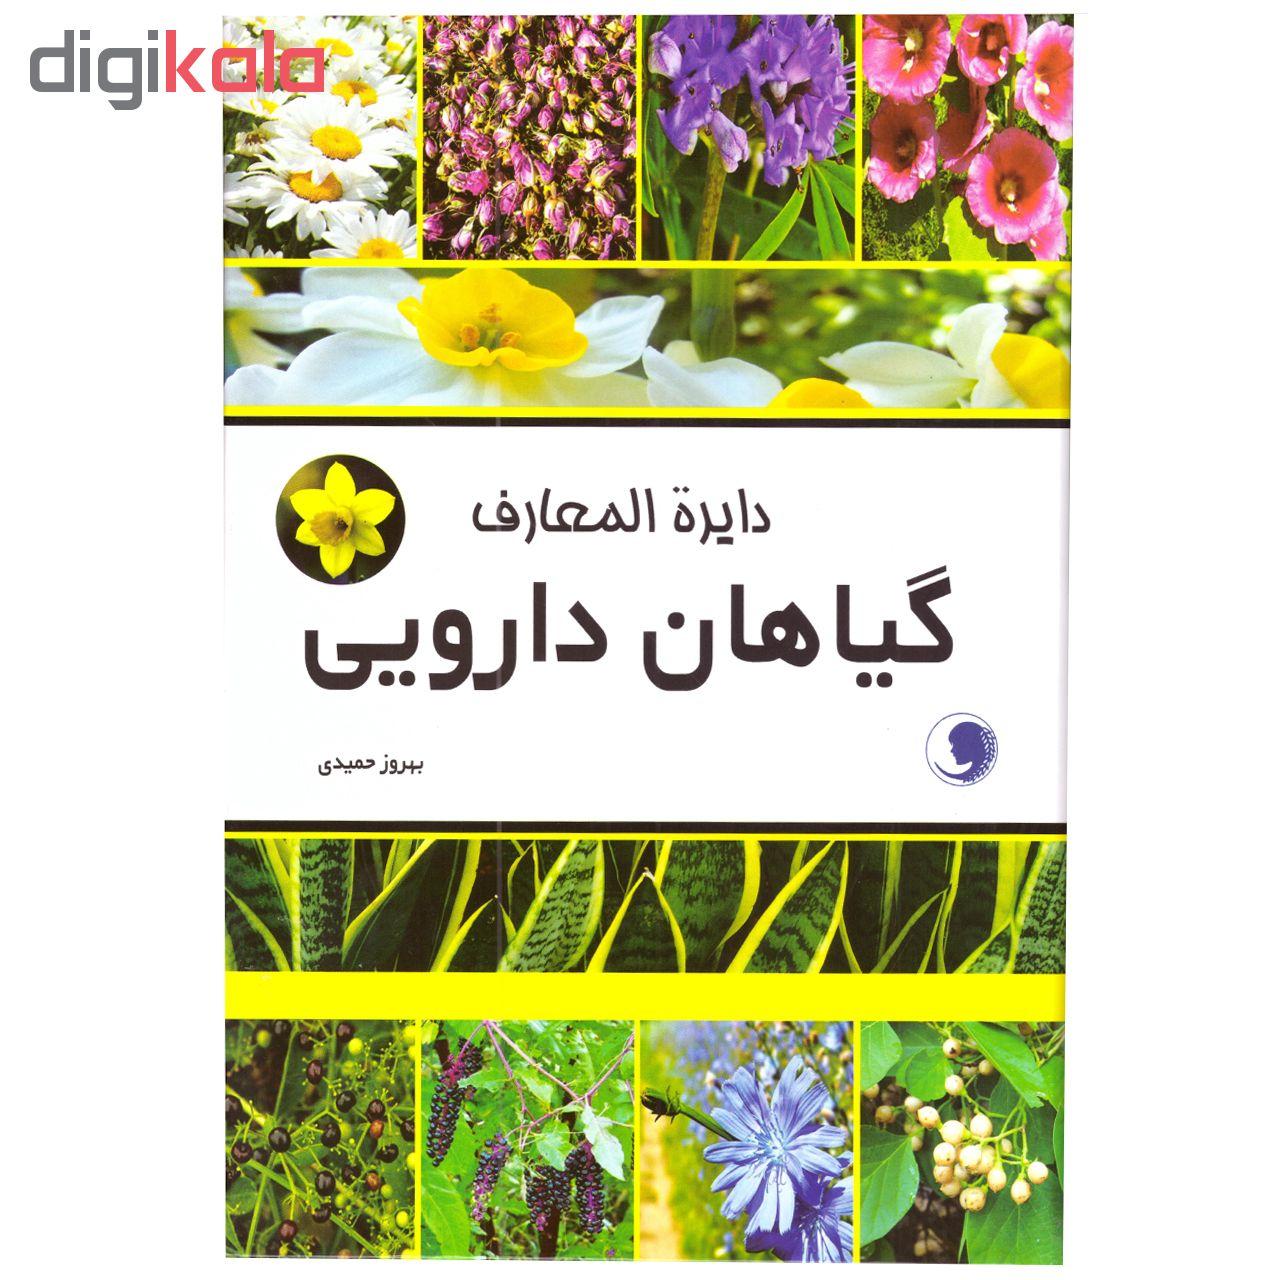 کتاب دایرة المعارف گیاهان دارویی نشر گندم سرخ حوا